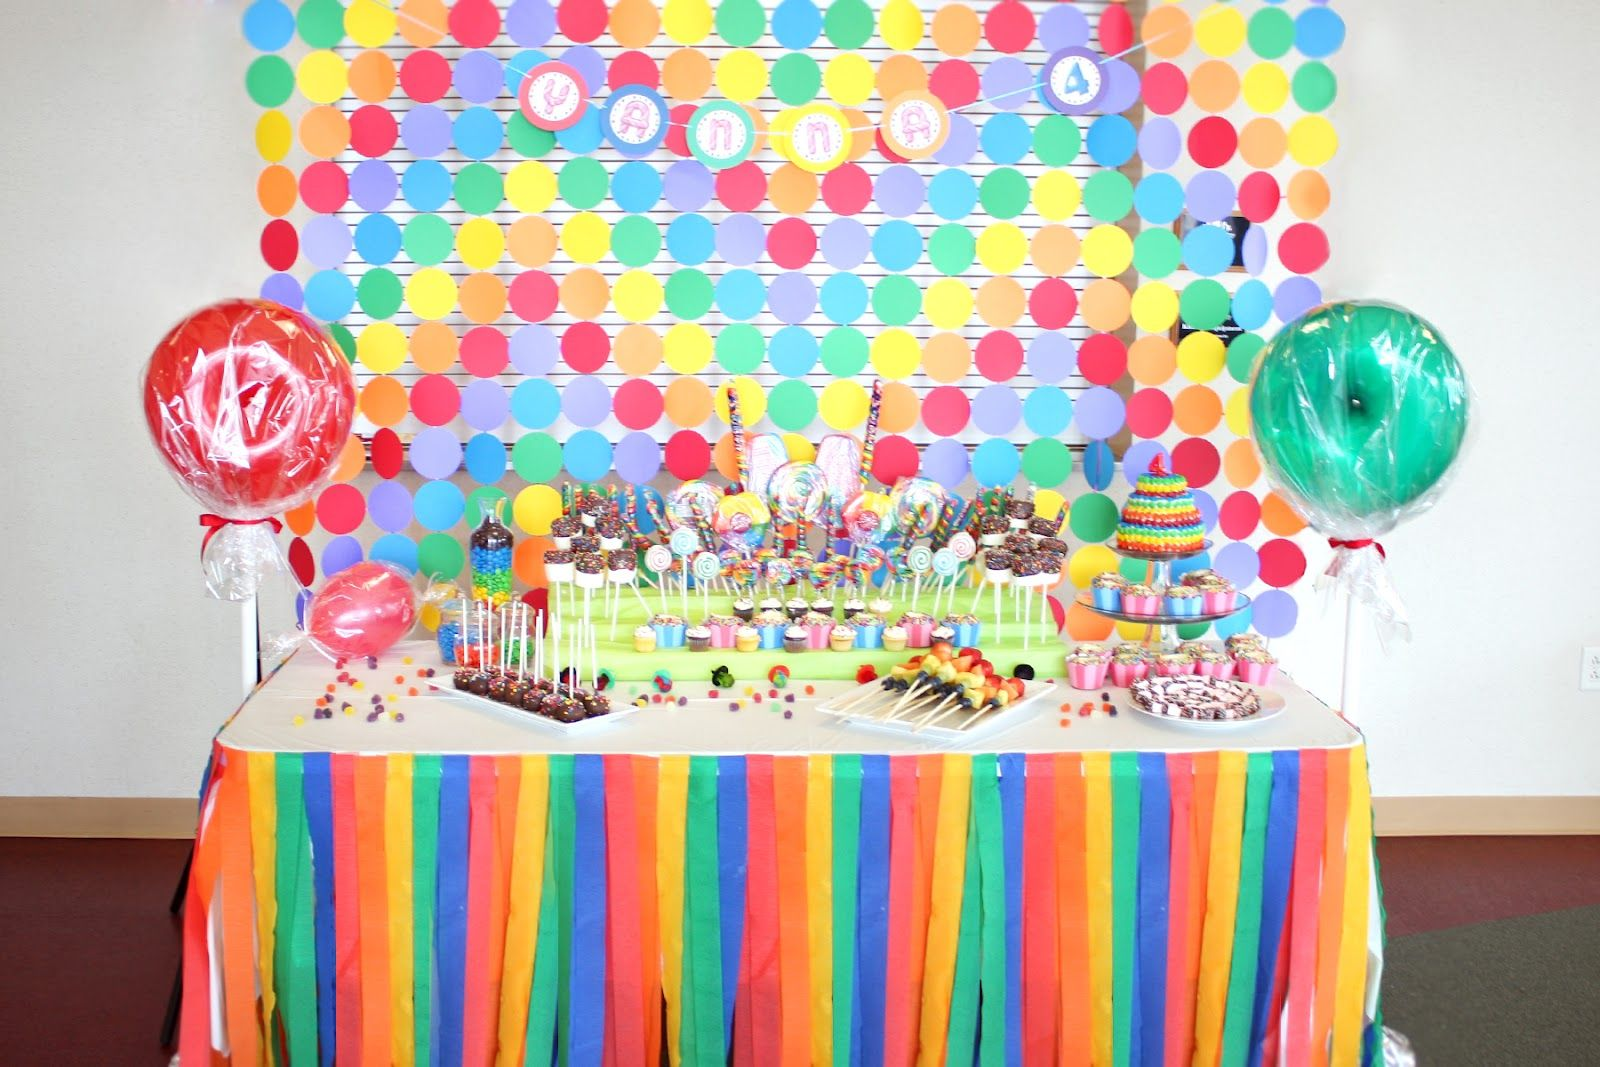 Candyland Party Centerpieces Wwwpixsharkcom Images